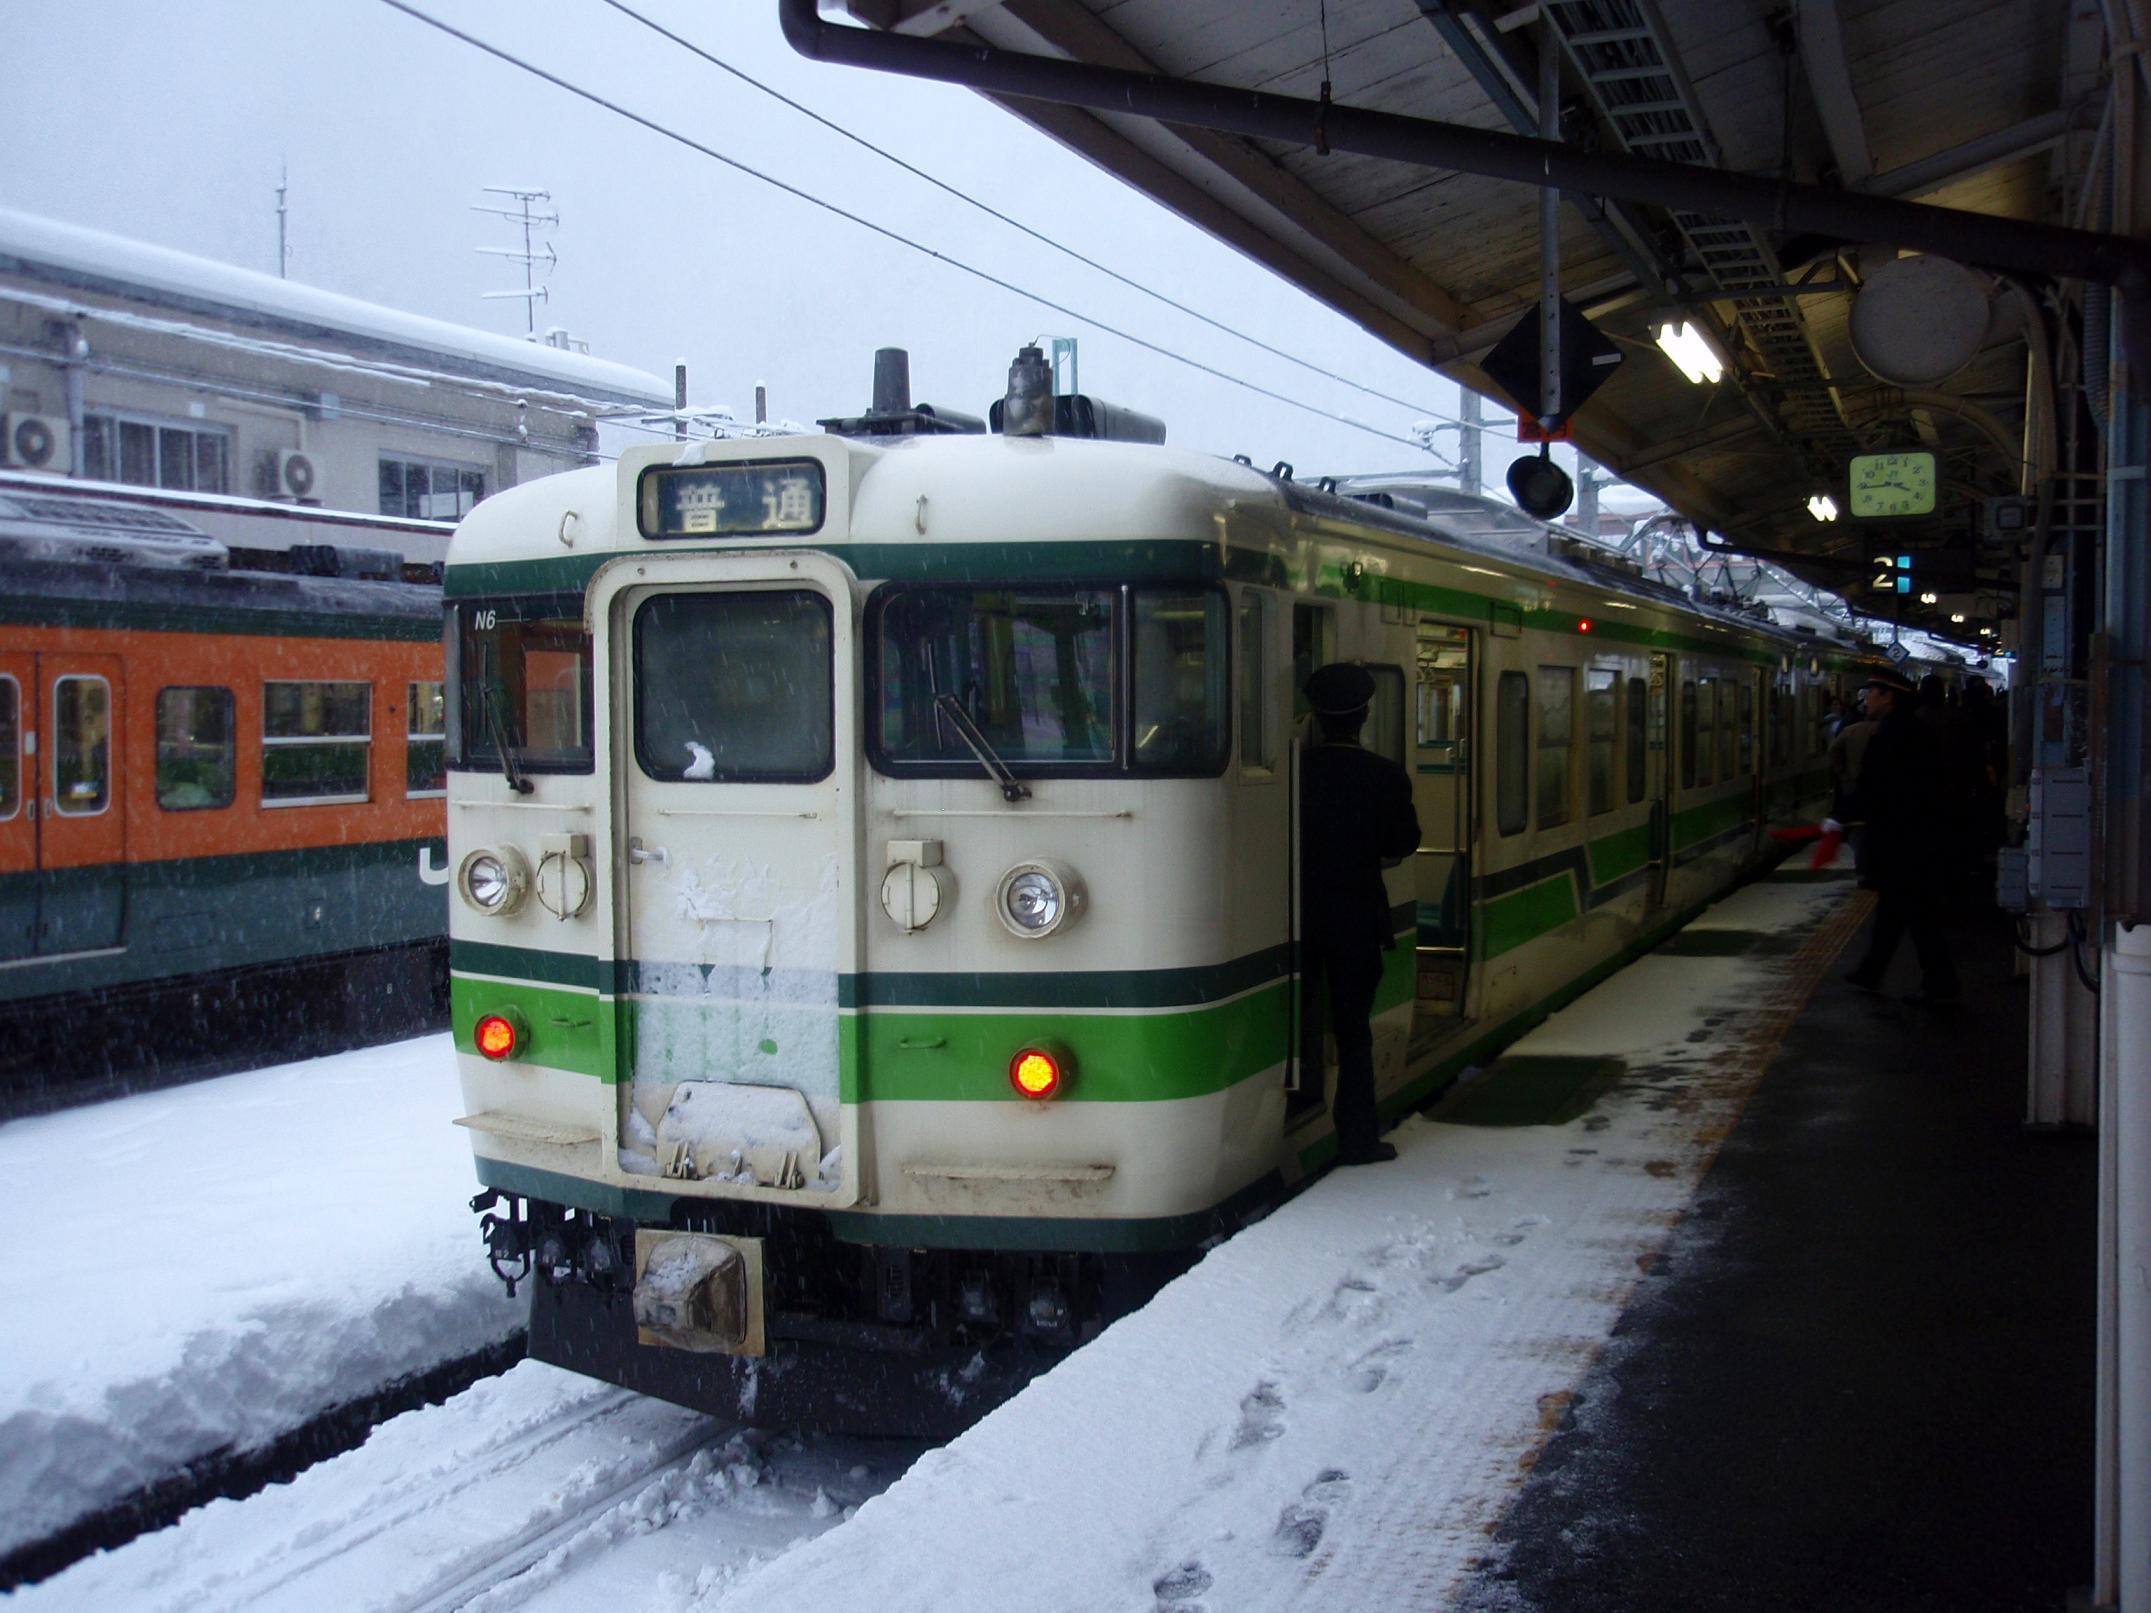 P1020016.jpg